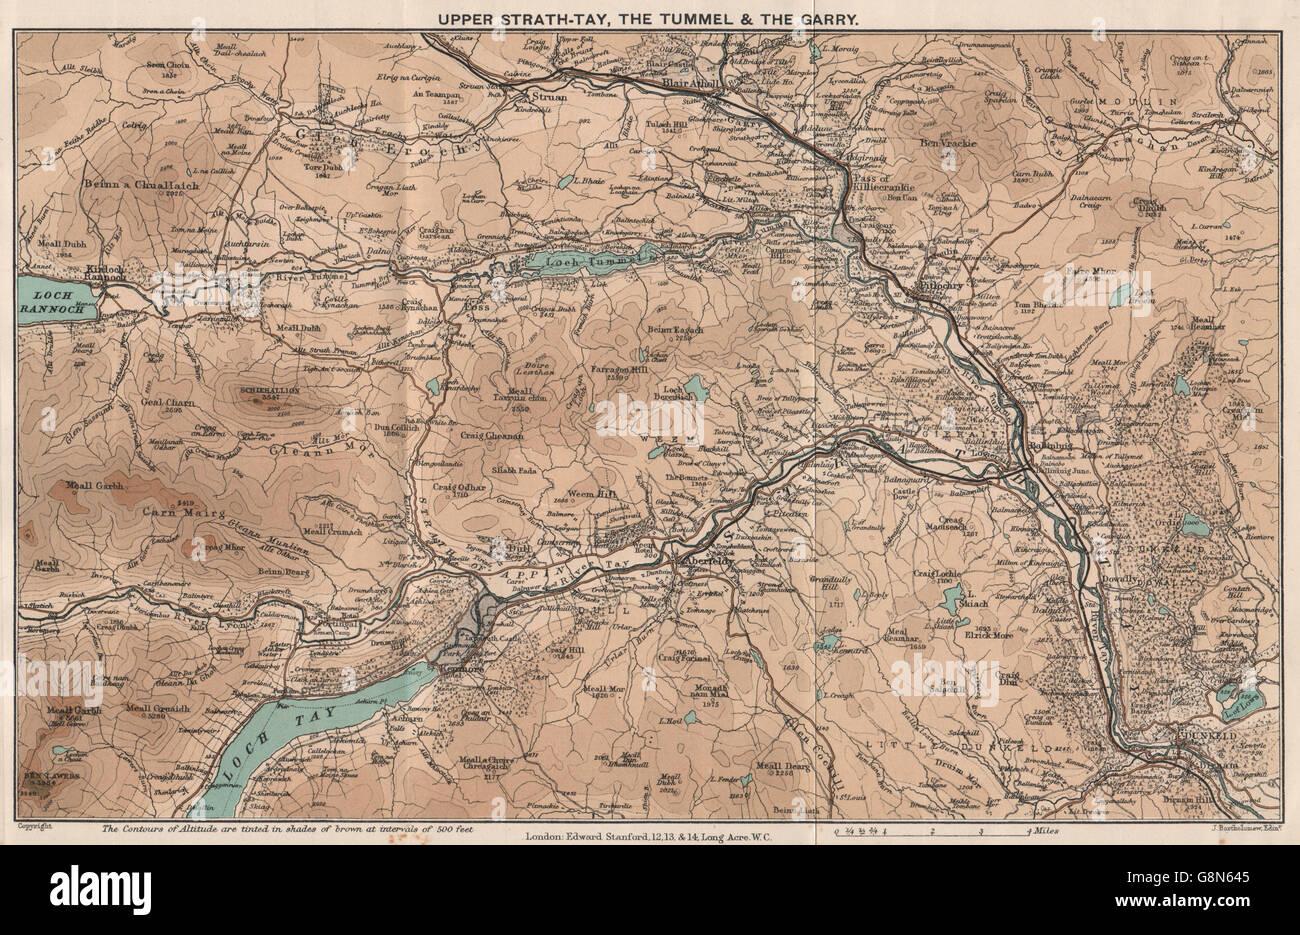 Pitlochry Scotland Map.Upper Strathtay Tummel Garry Dunkeld Pitlochry Scotland Stock